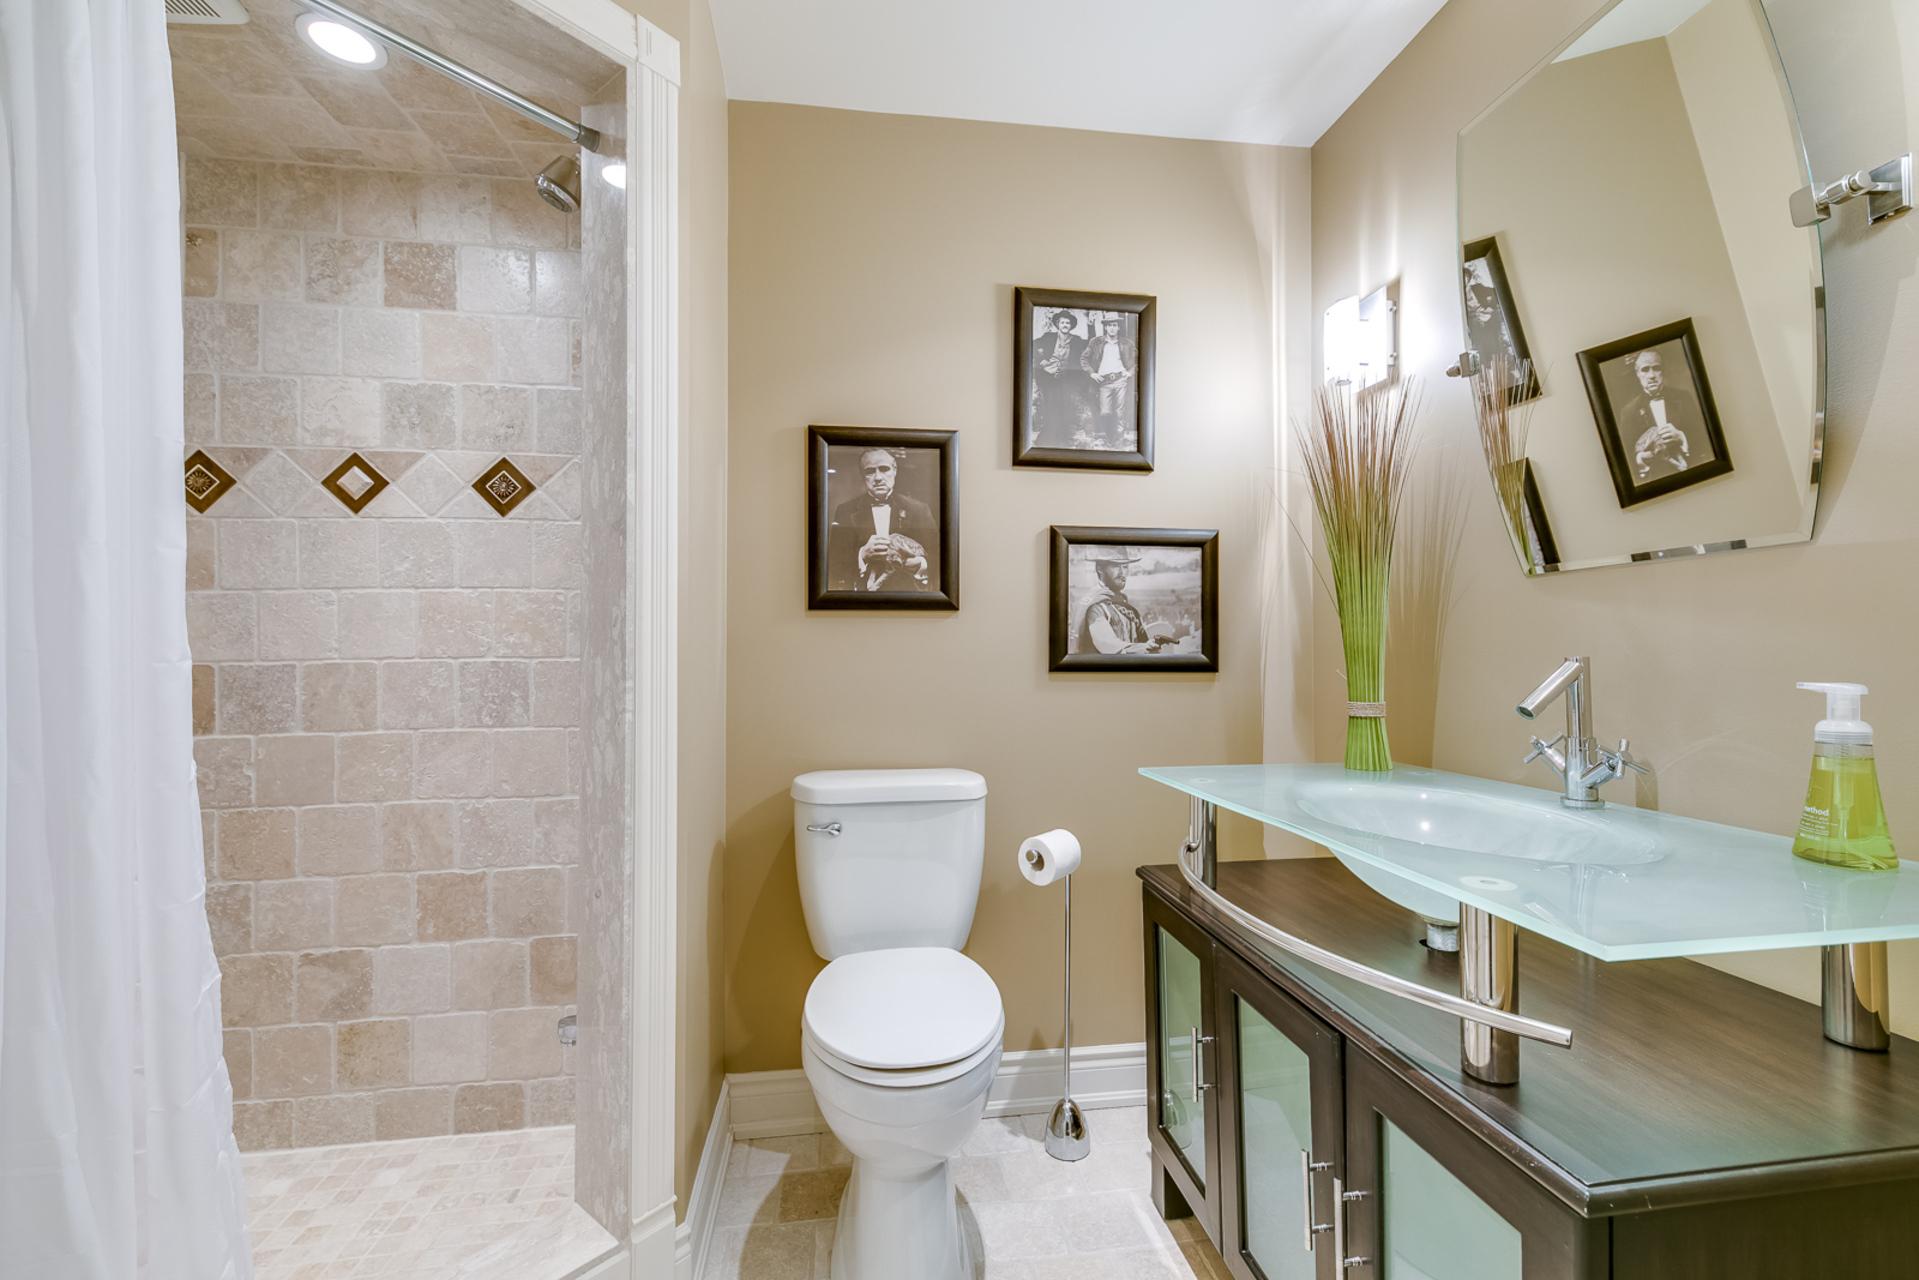 Basement Bathroom - 2460 Bon Echo Dr, Oakville - Elite3 & Team at 2460 Bon Echo Drive, Iroquois Ridge North, Oakville